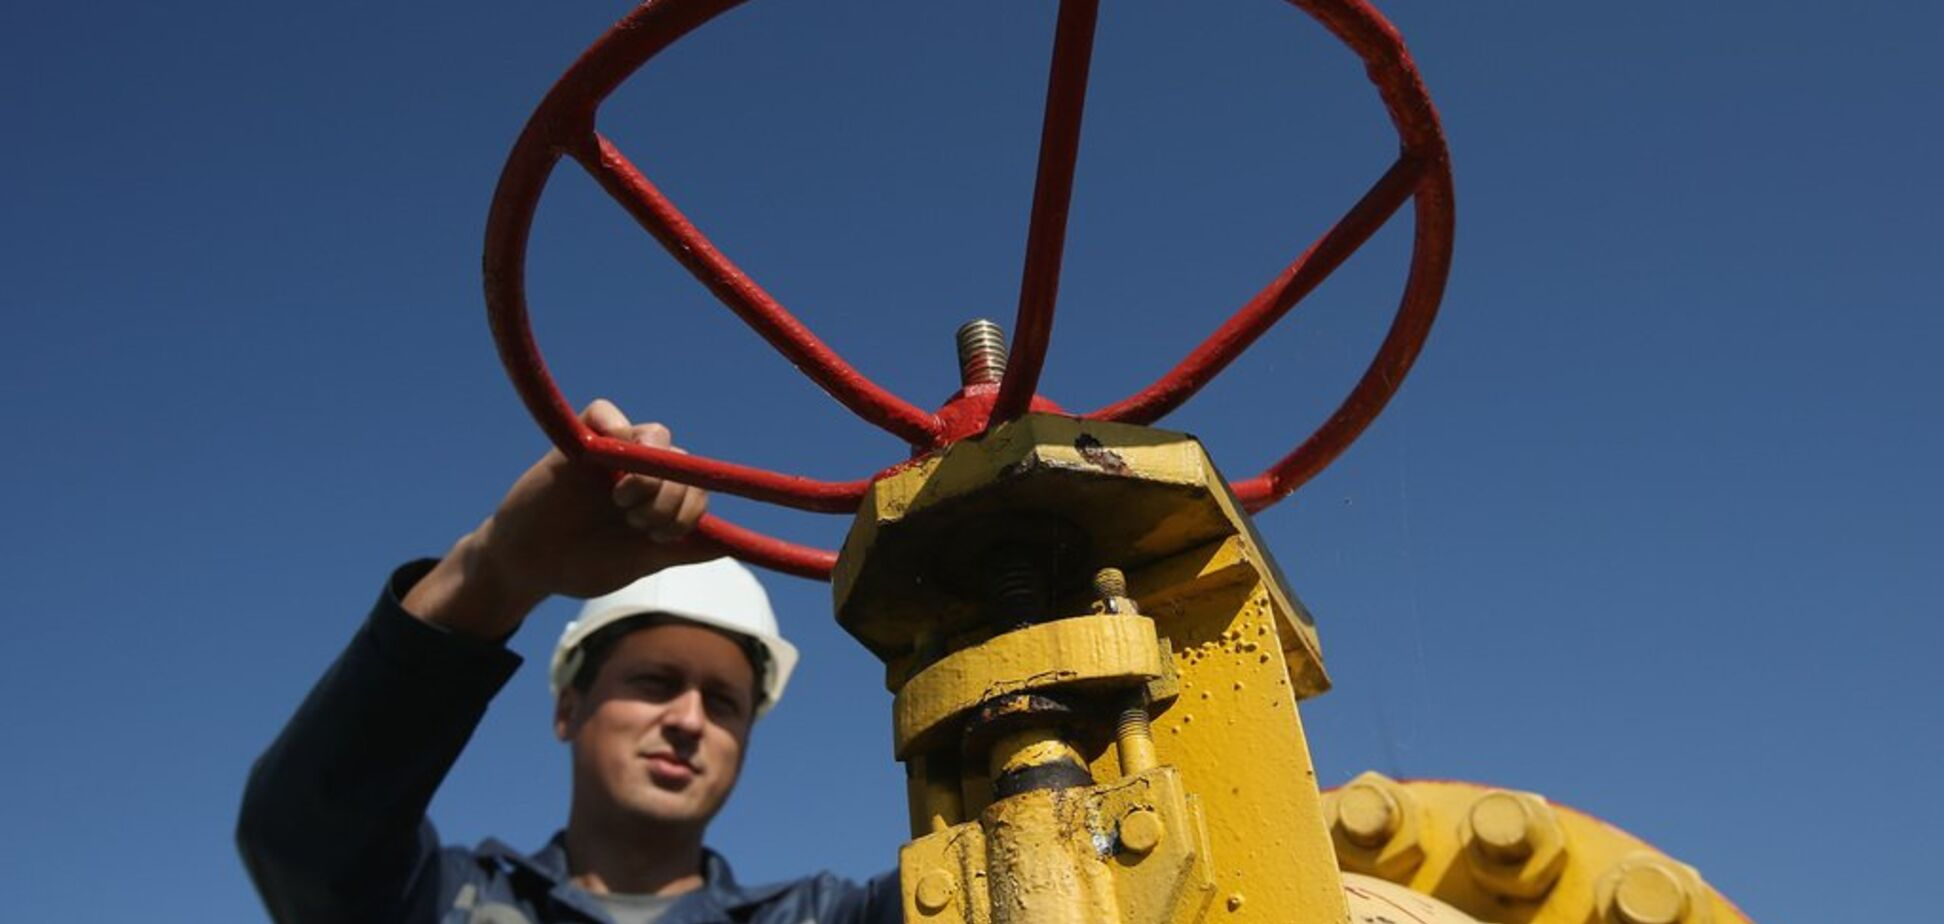 Україна на 25% скоротила імпорт газу в 2018 році